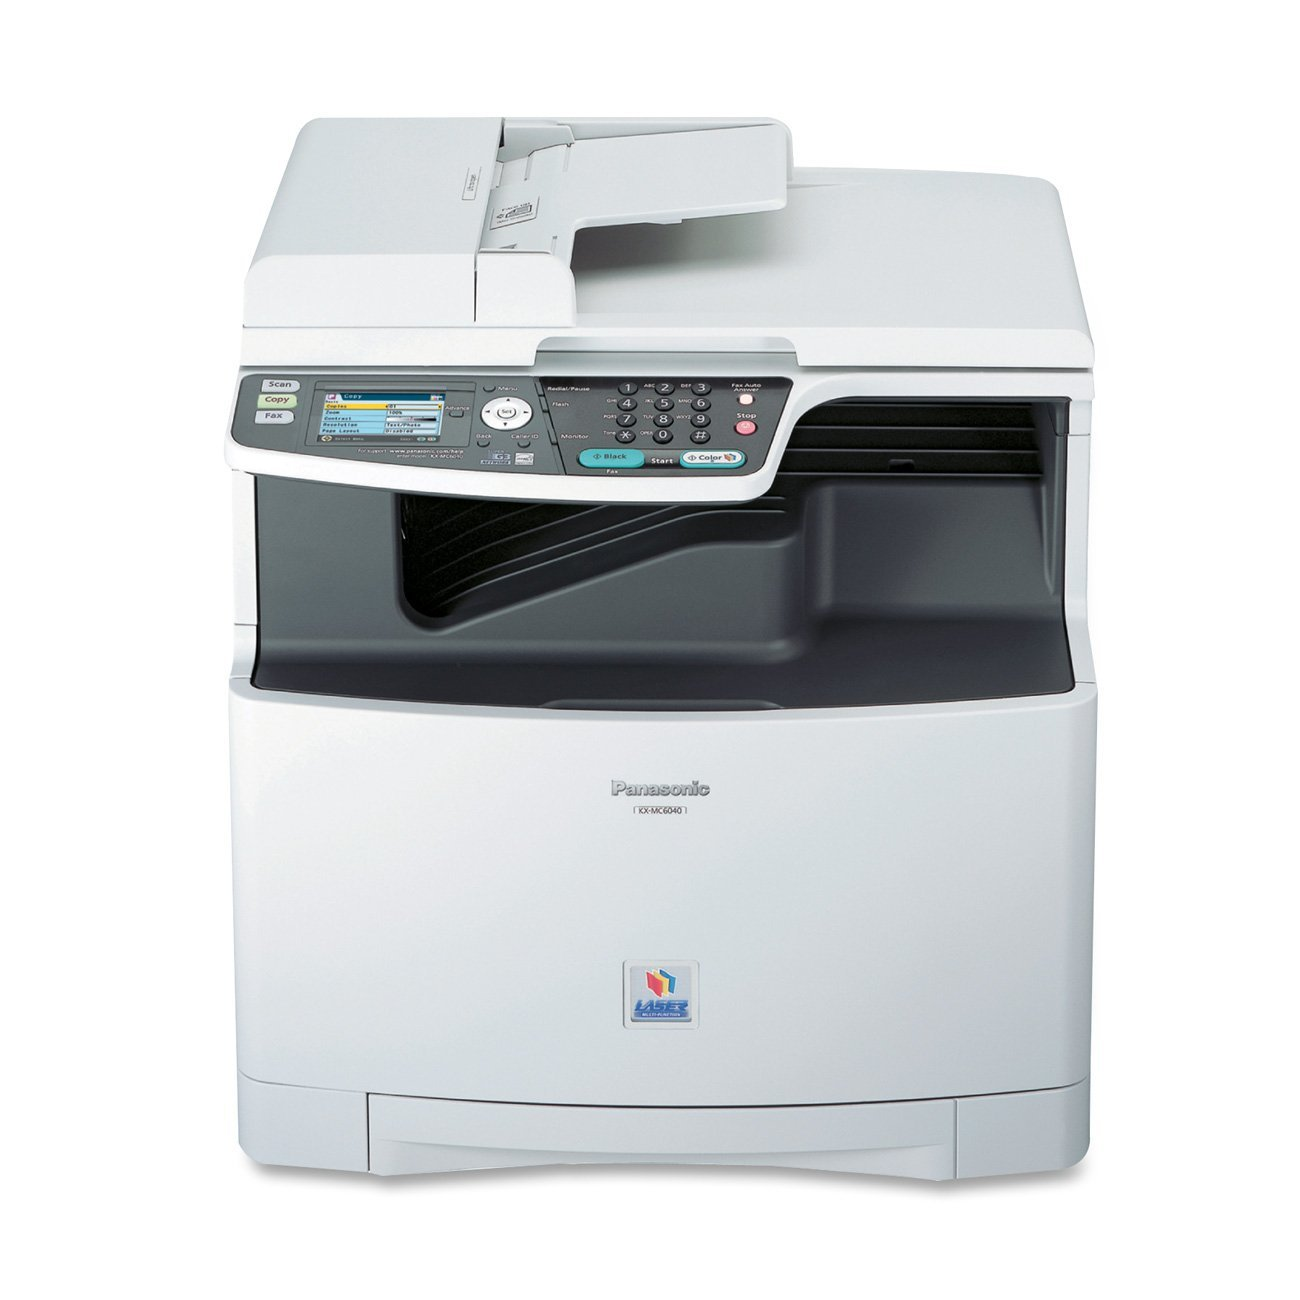 Panasonic Printer Driver - Free downloads and reviews